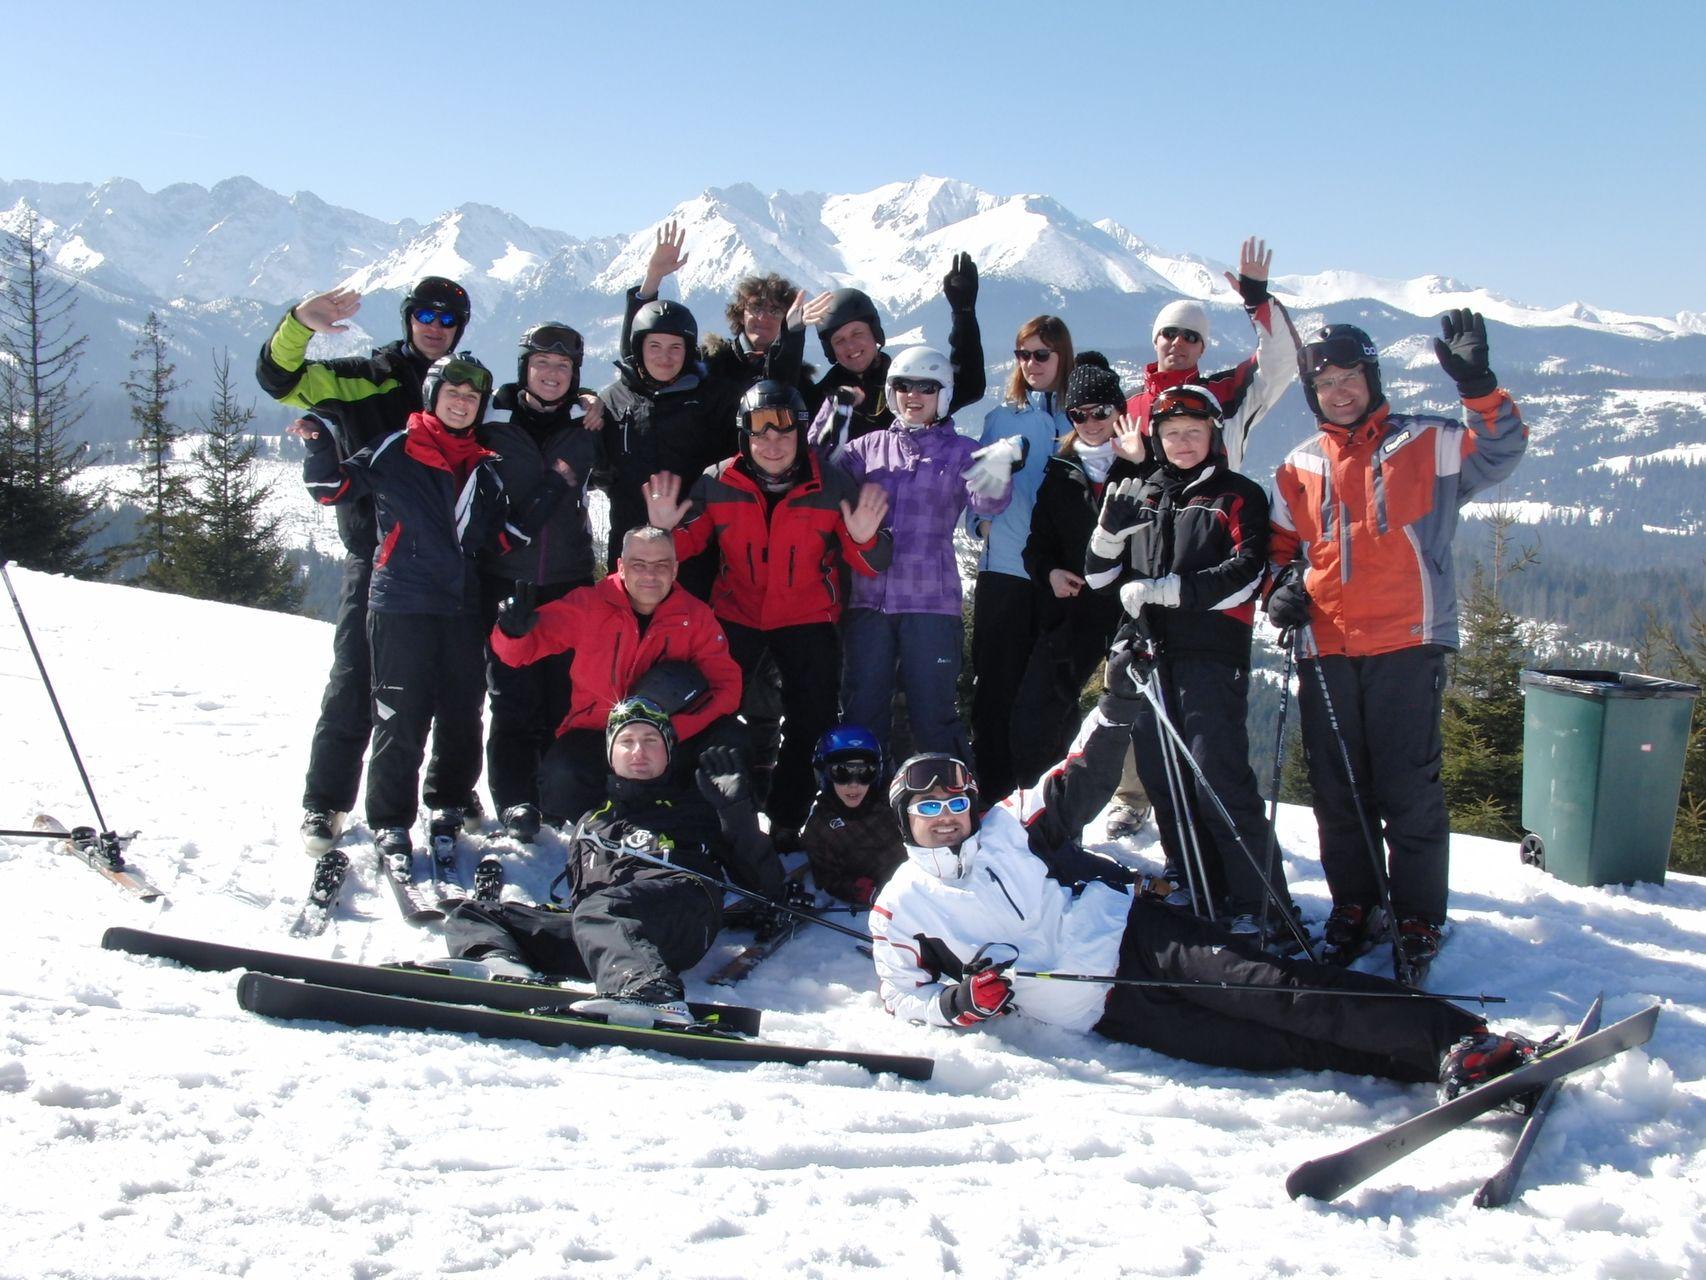 CarTourist_narty-snowboard_2012-foto-4